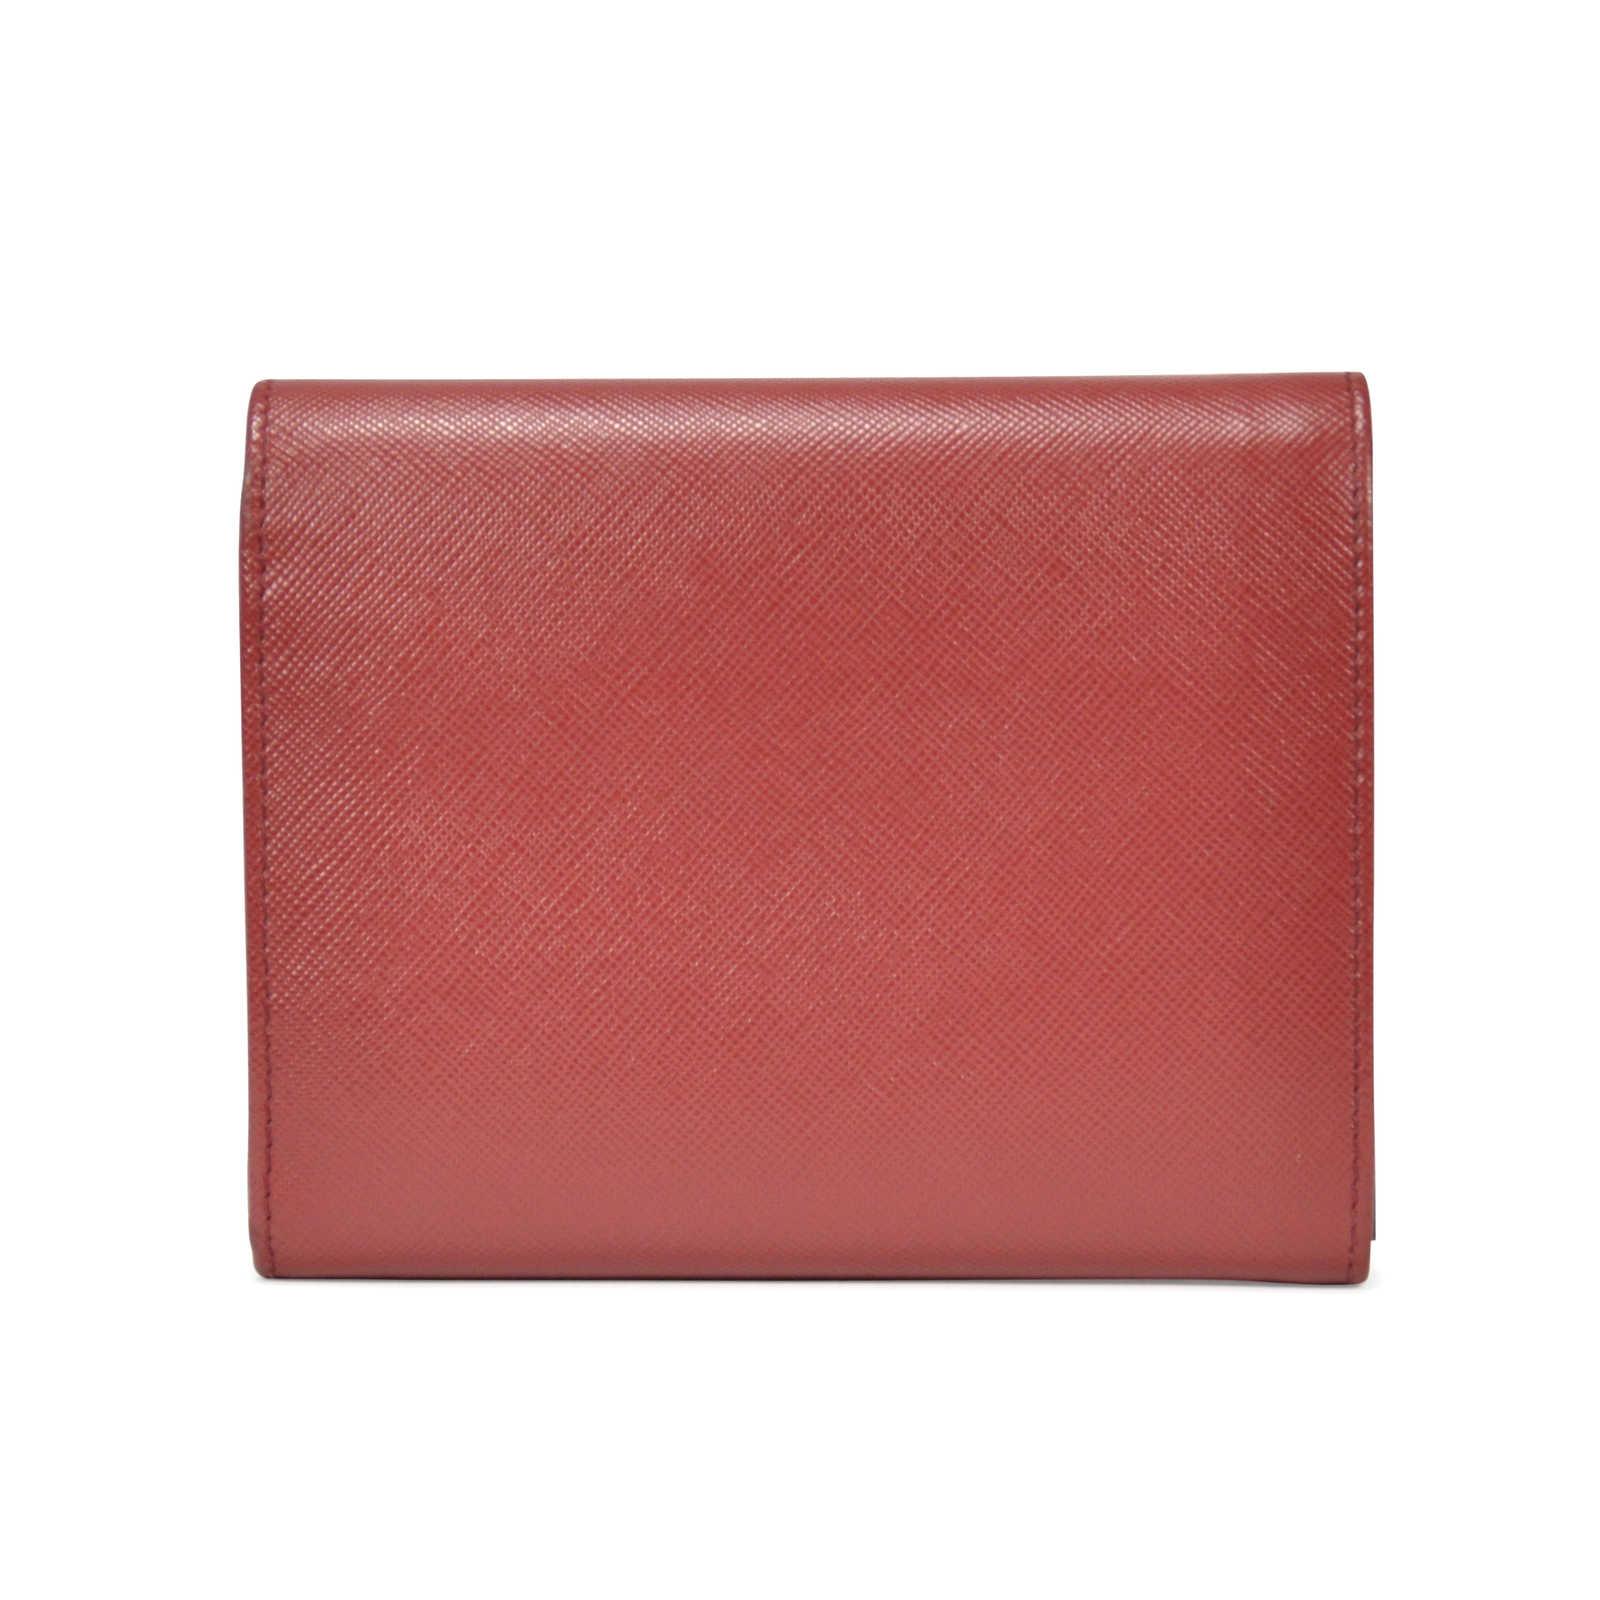 62c1c318 Authentic Second Hand Prada Saffiano Foldover Wallet (PSS-199-00008 ...